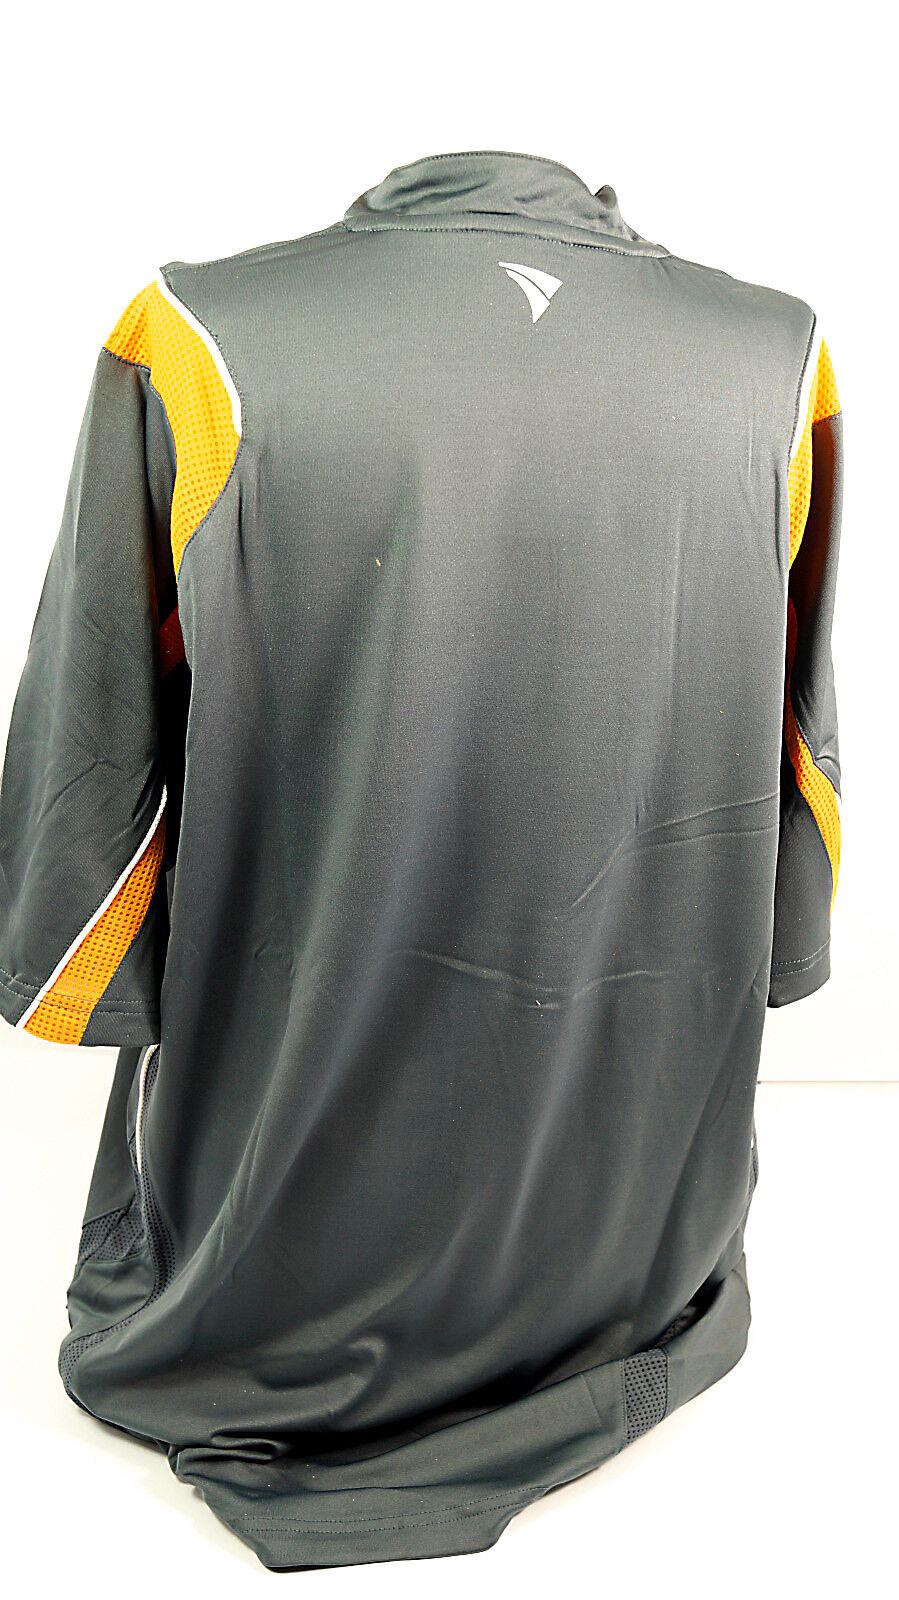 NEUJAKO T-Shirt Grau Orange Gr. XL grau Orange classic tour tour tour new 15d2d7